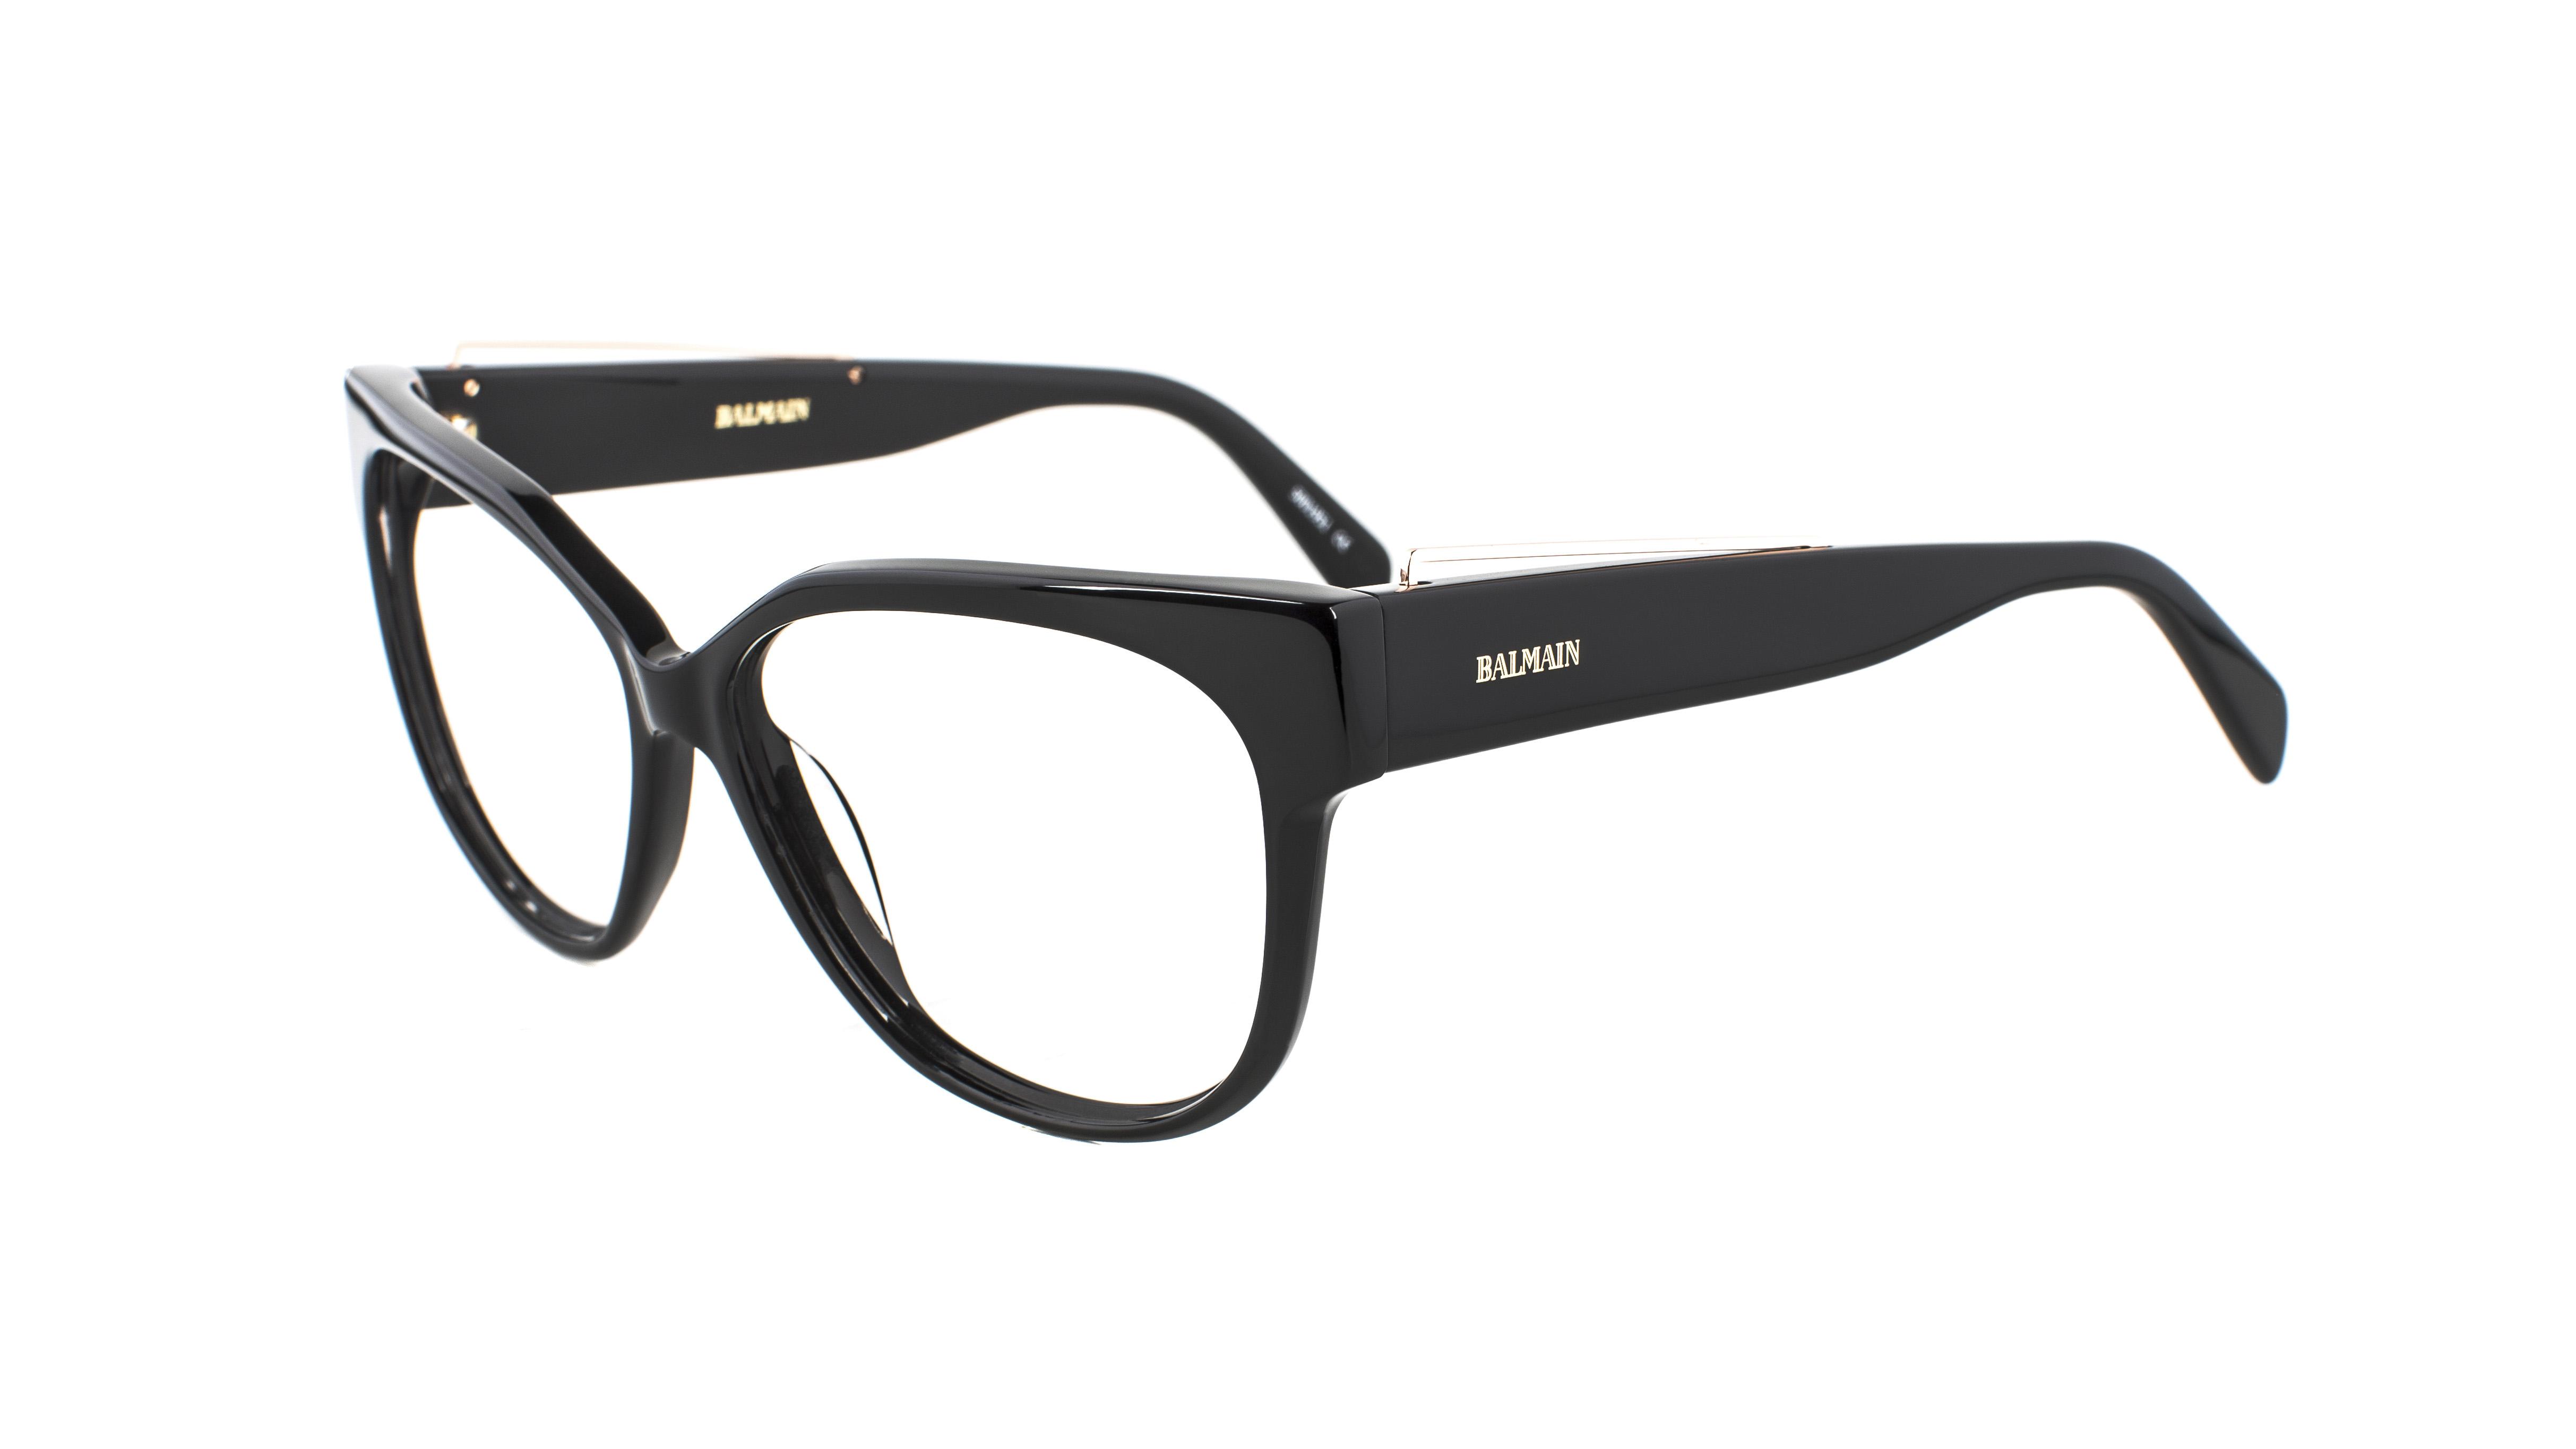 Balmain x Specsavers BL1528S 30570771 - RRP 2 pairs single vision $459 (2)